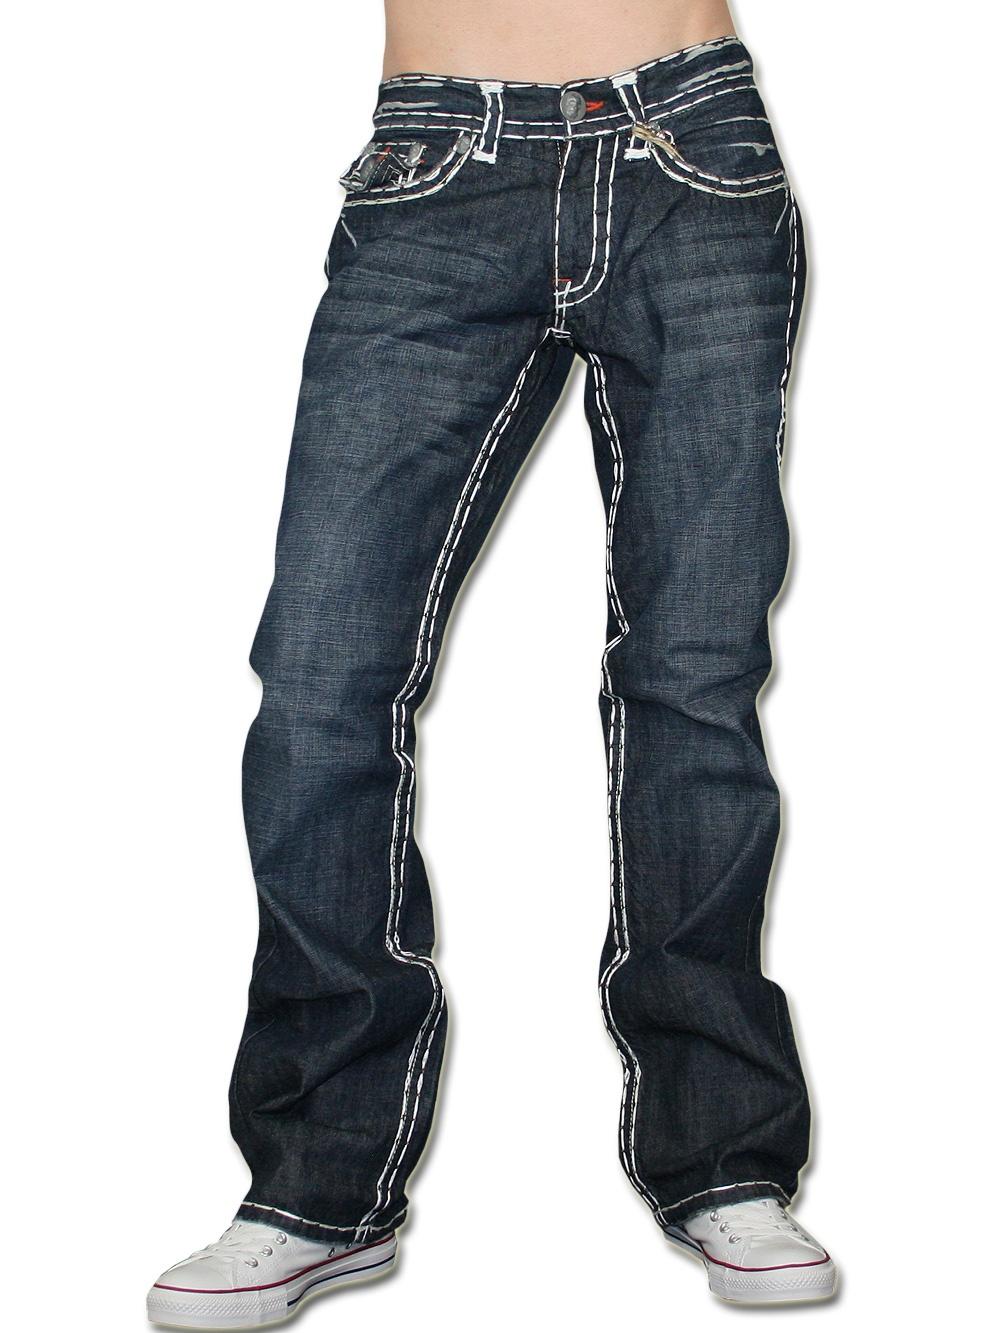 laguna beach jeans herren jeans bolsa chica beach 32 laguna beach jeans 5409 32 jeans. Black Bedroom Furniture Sets. Home Design Ideas